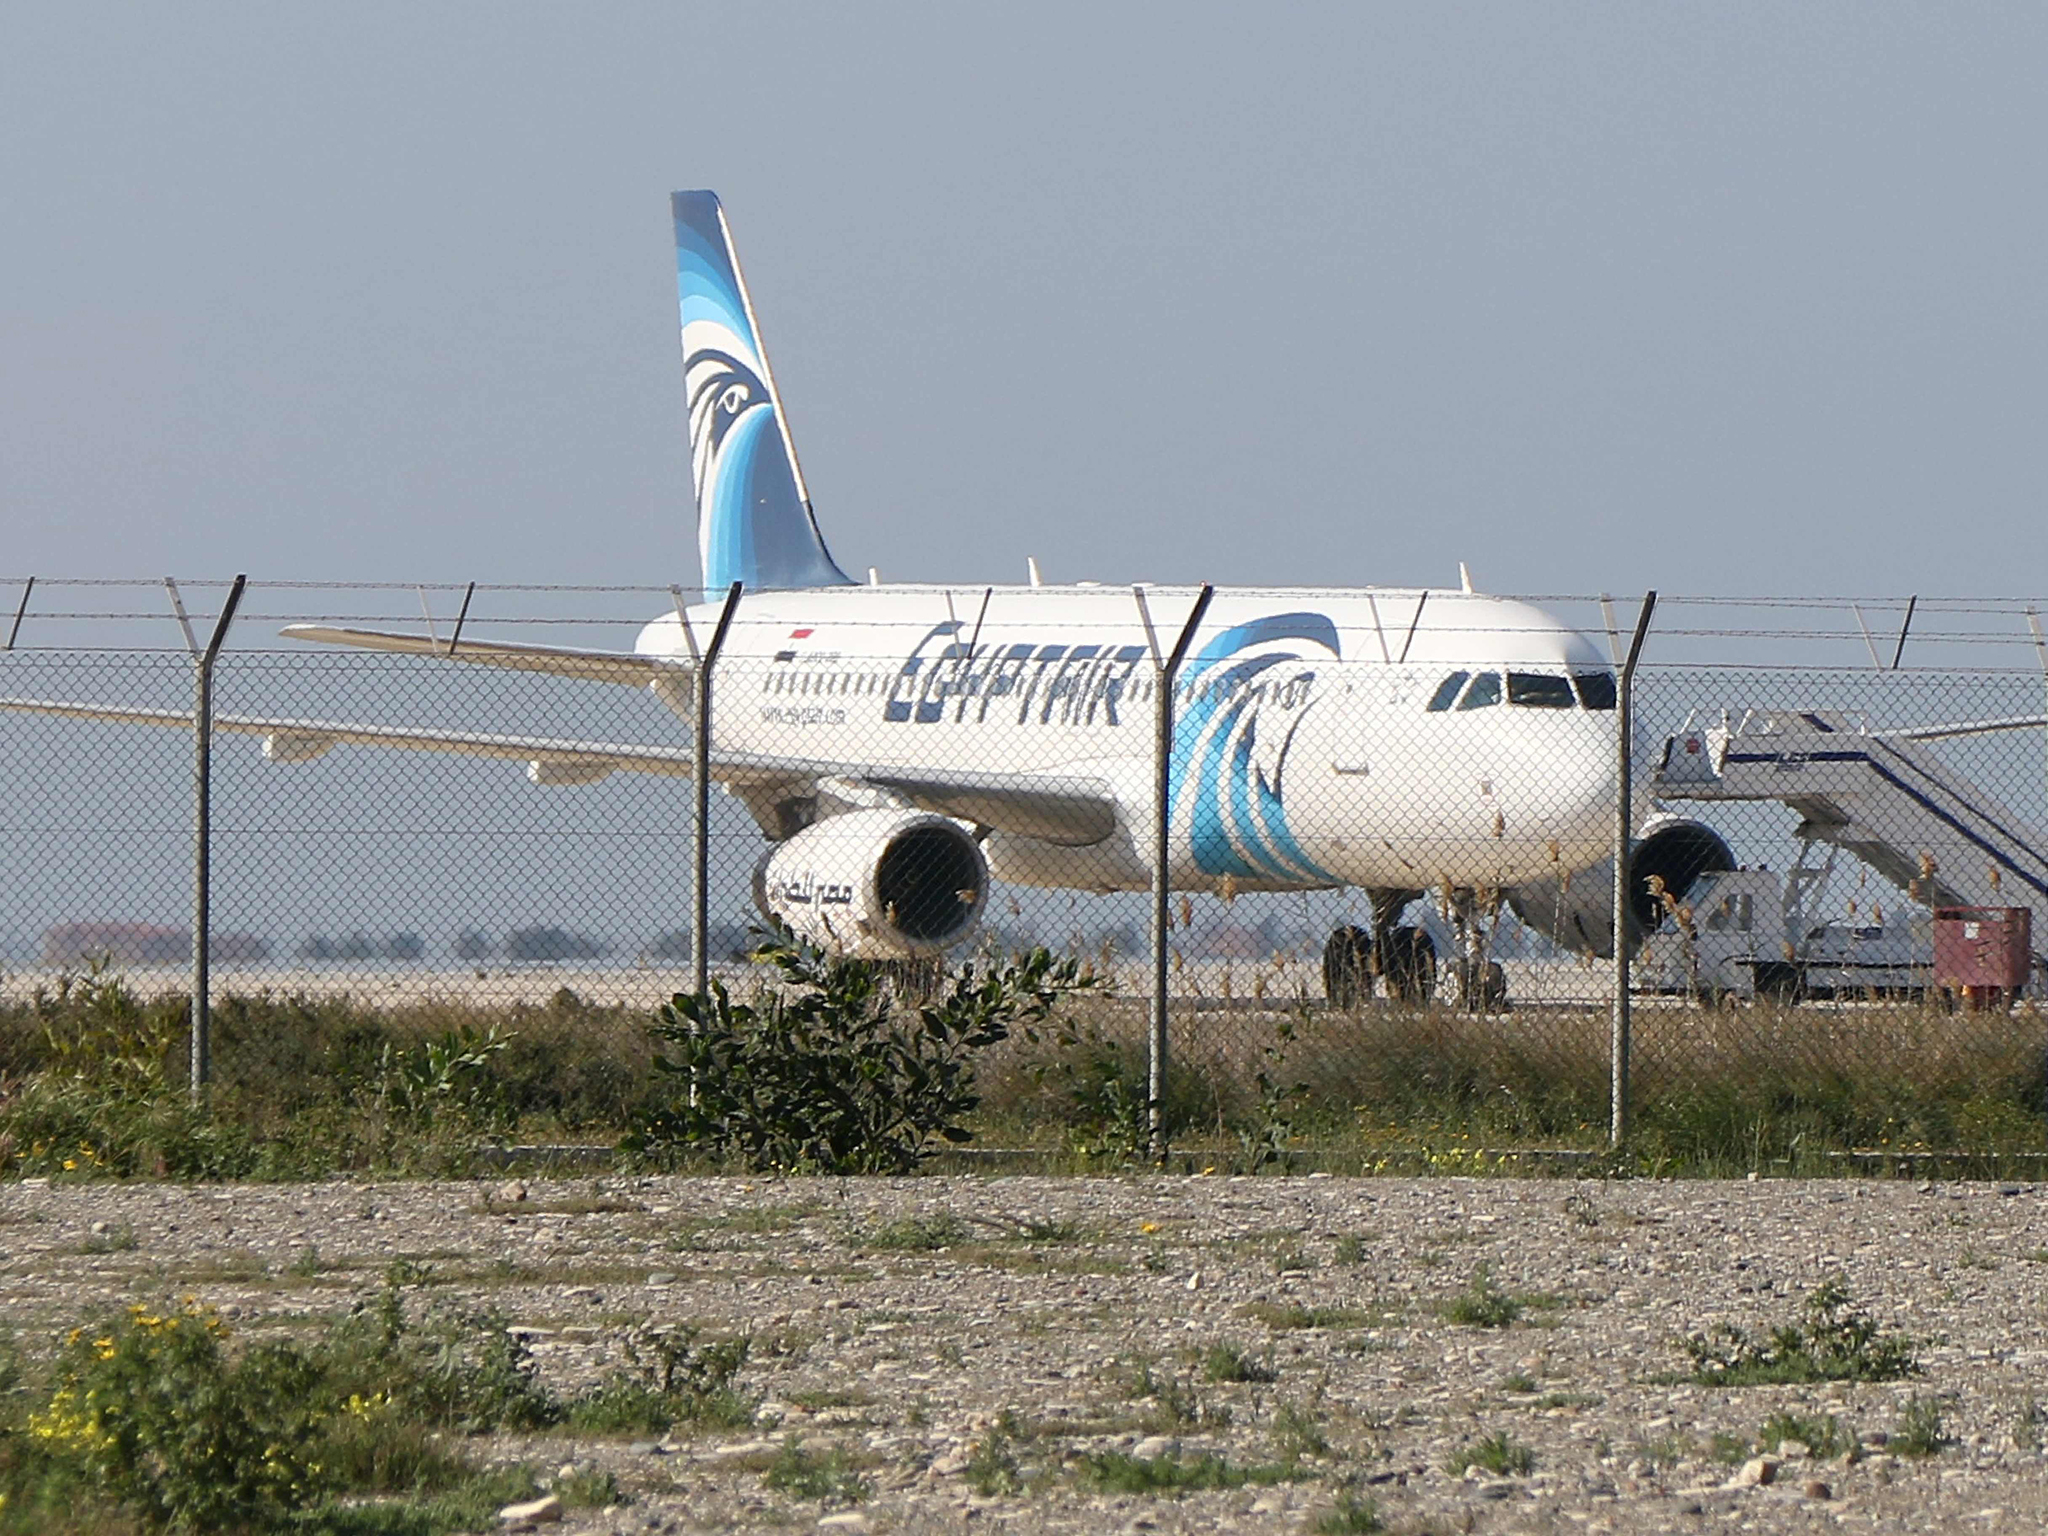 egypt-hijacked-plane-3.jpg